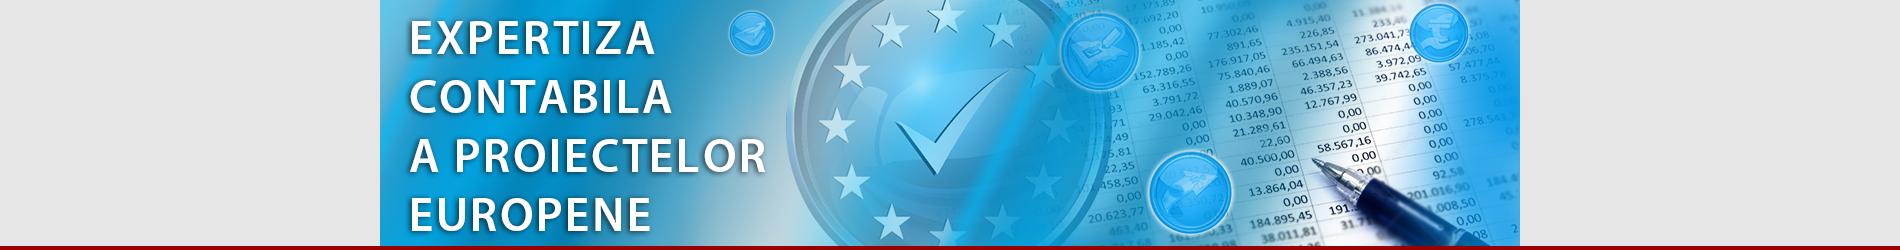 banner_site_expertiza contabila a pr europene